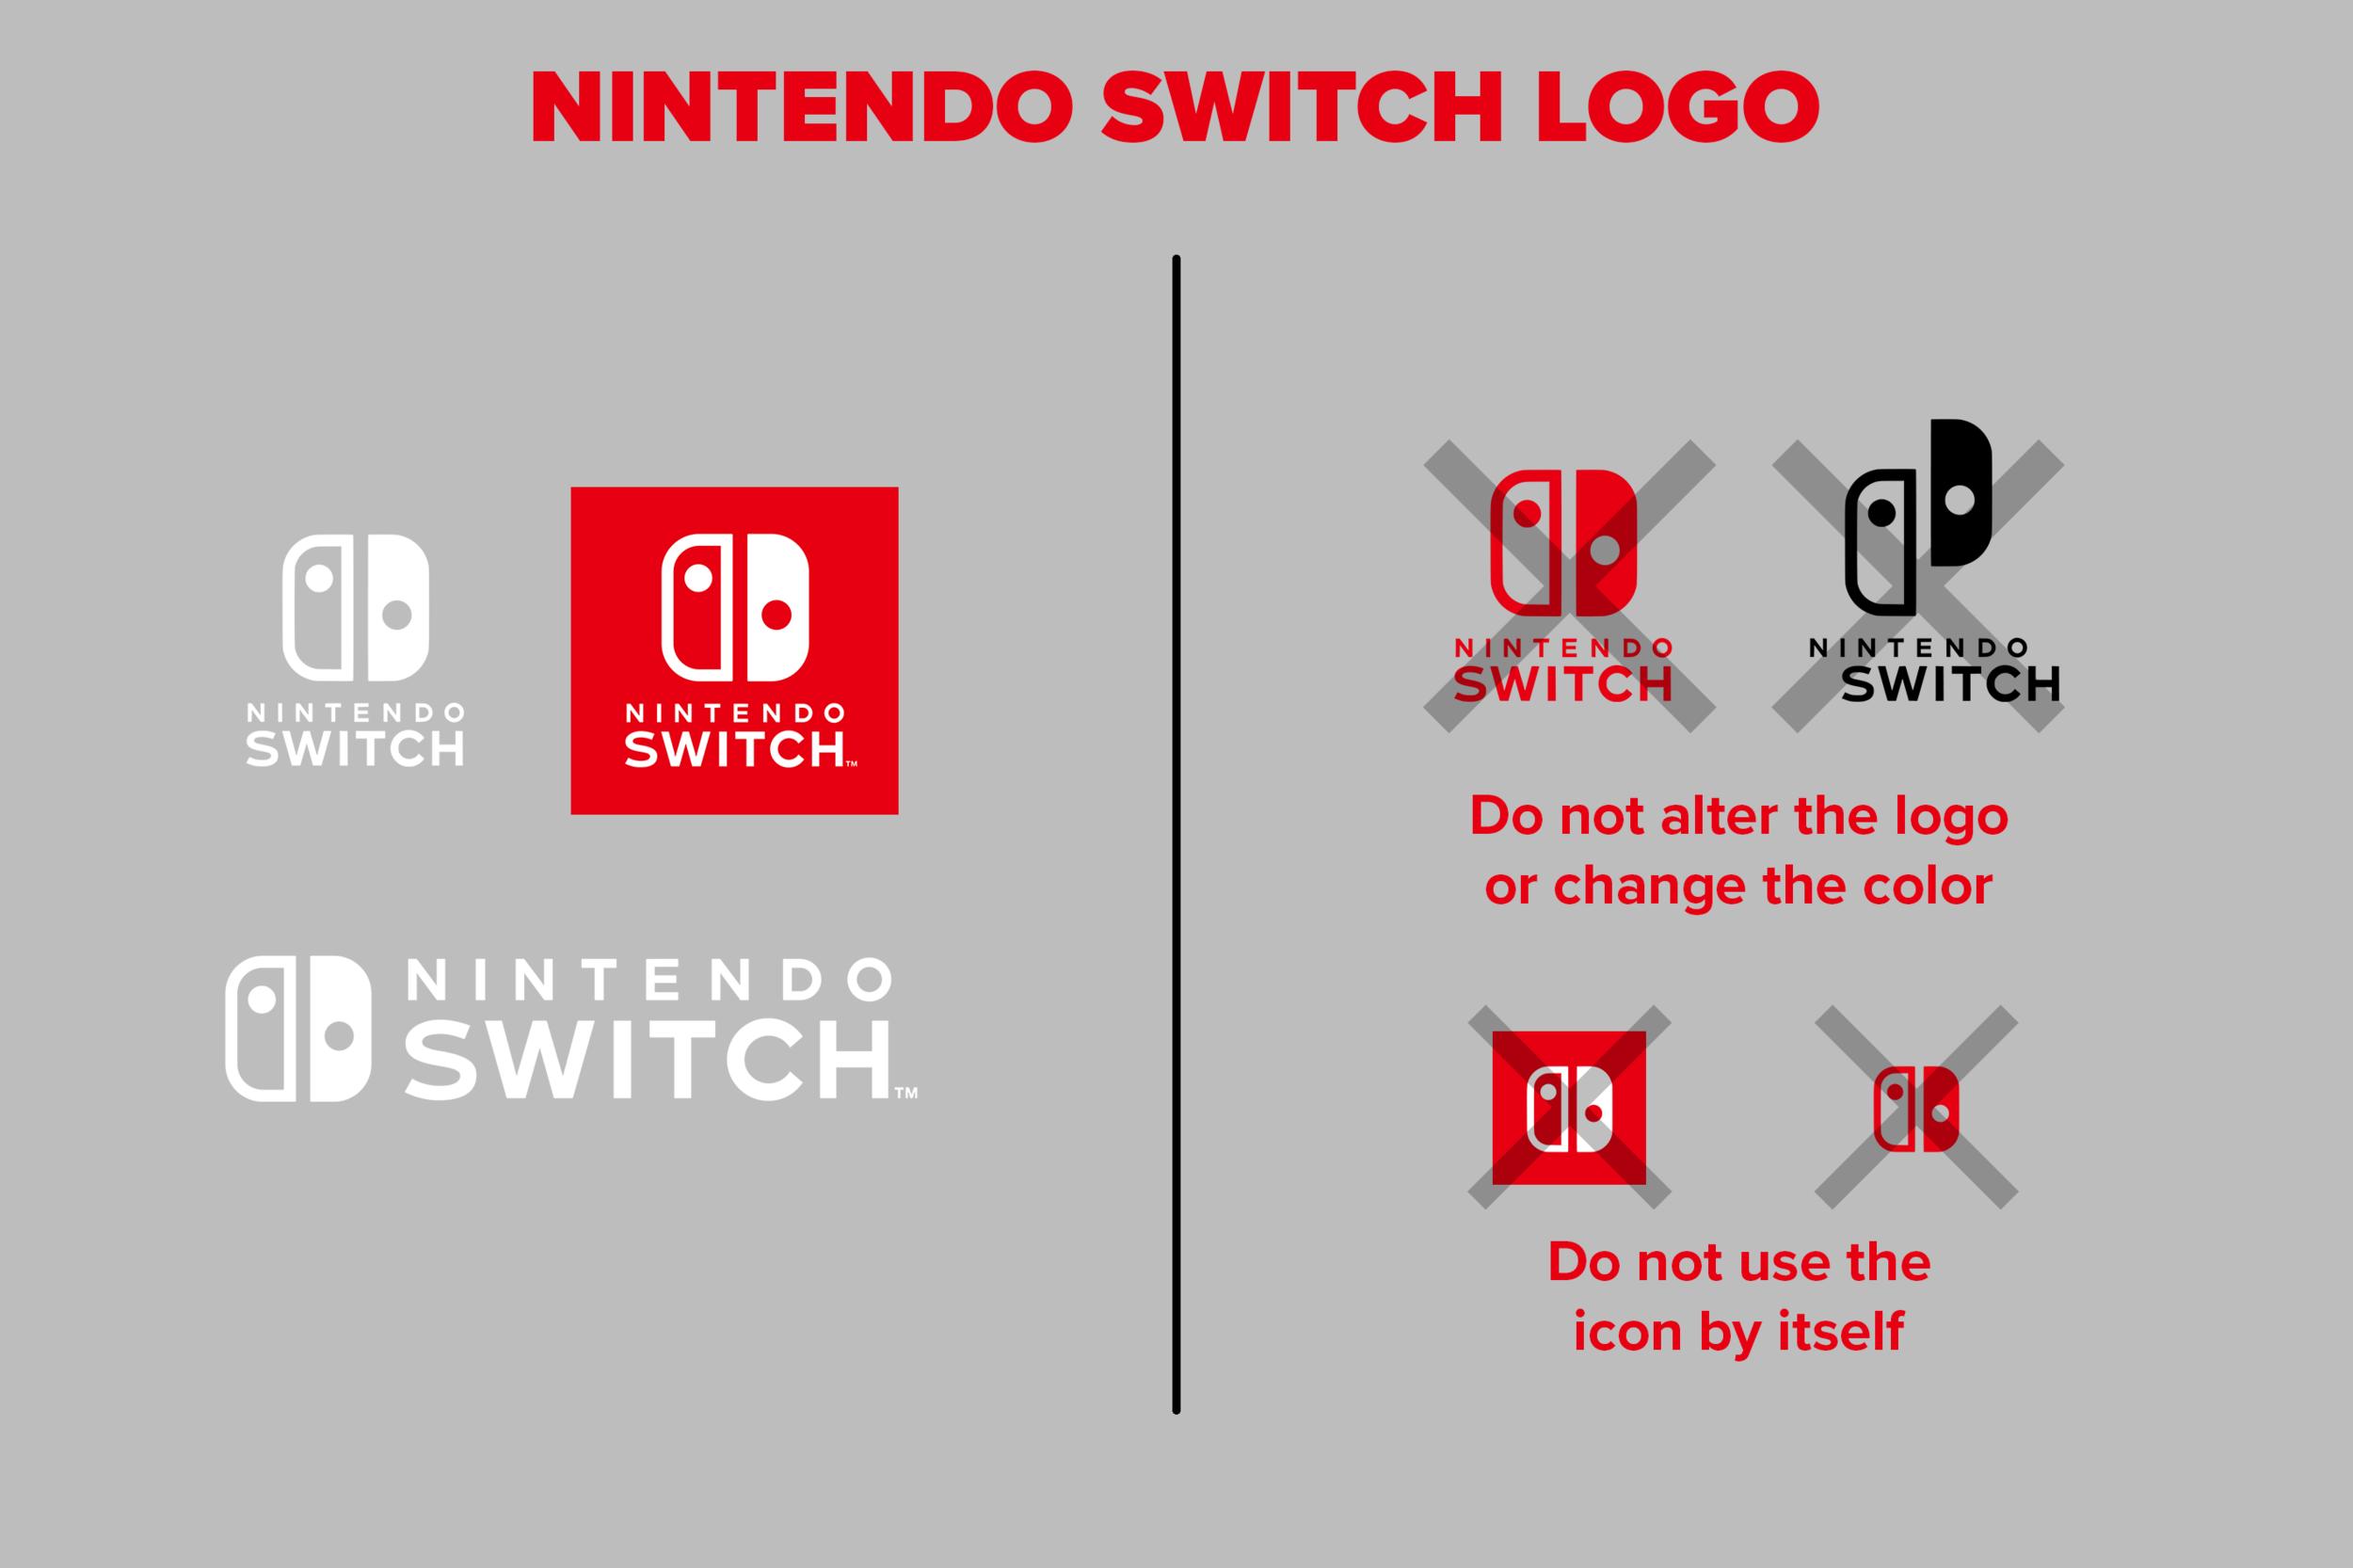 nintendo-switch-logo.png